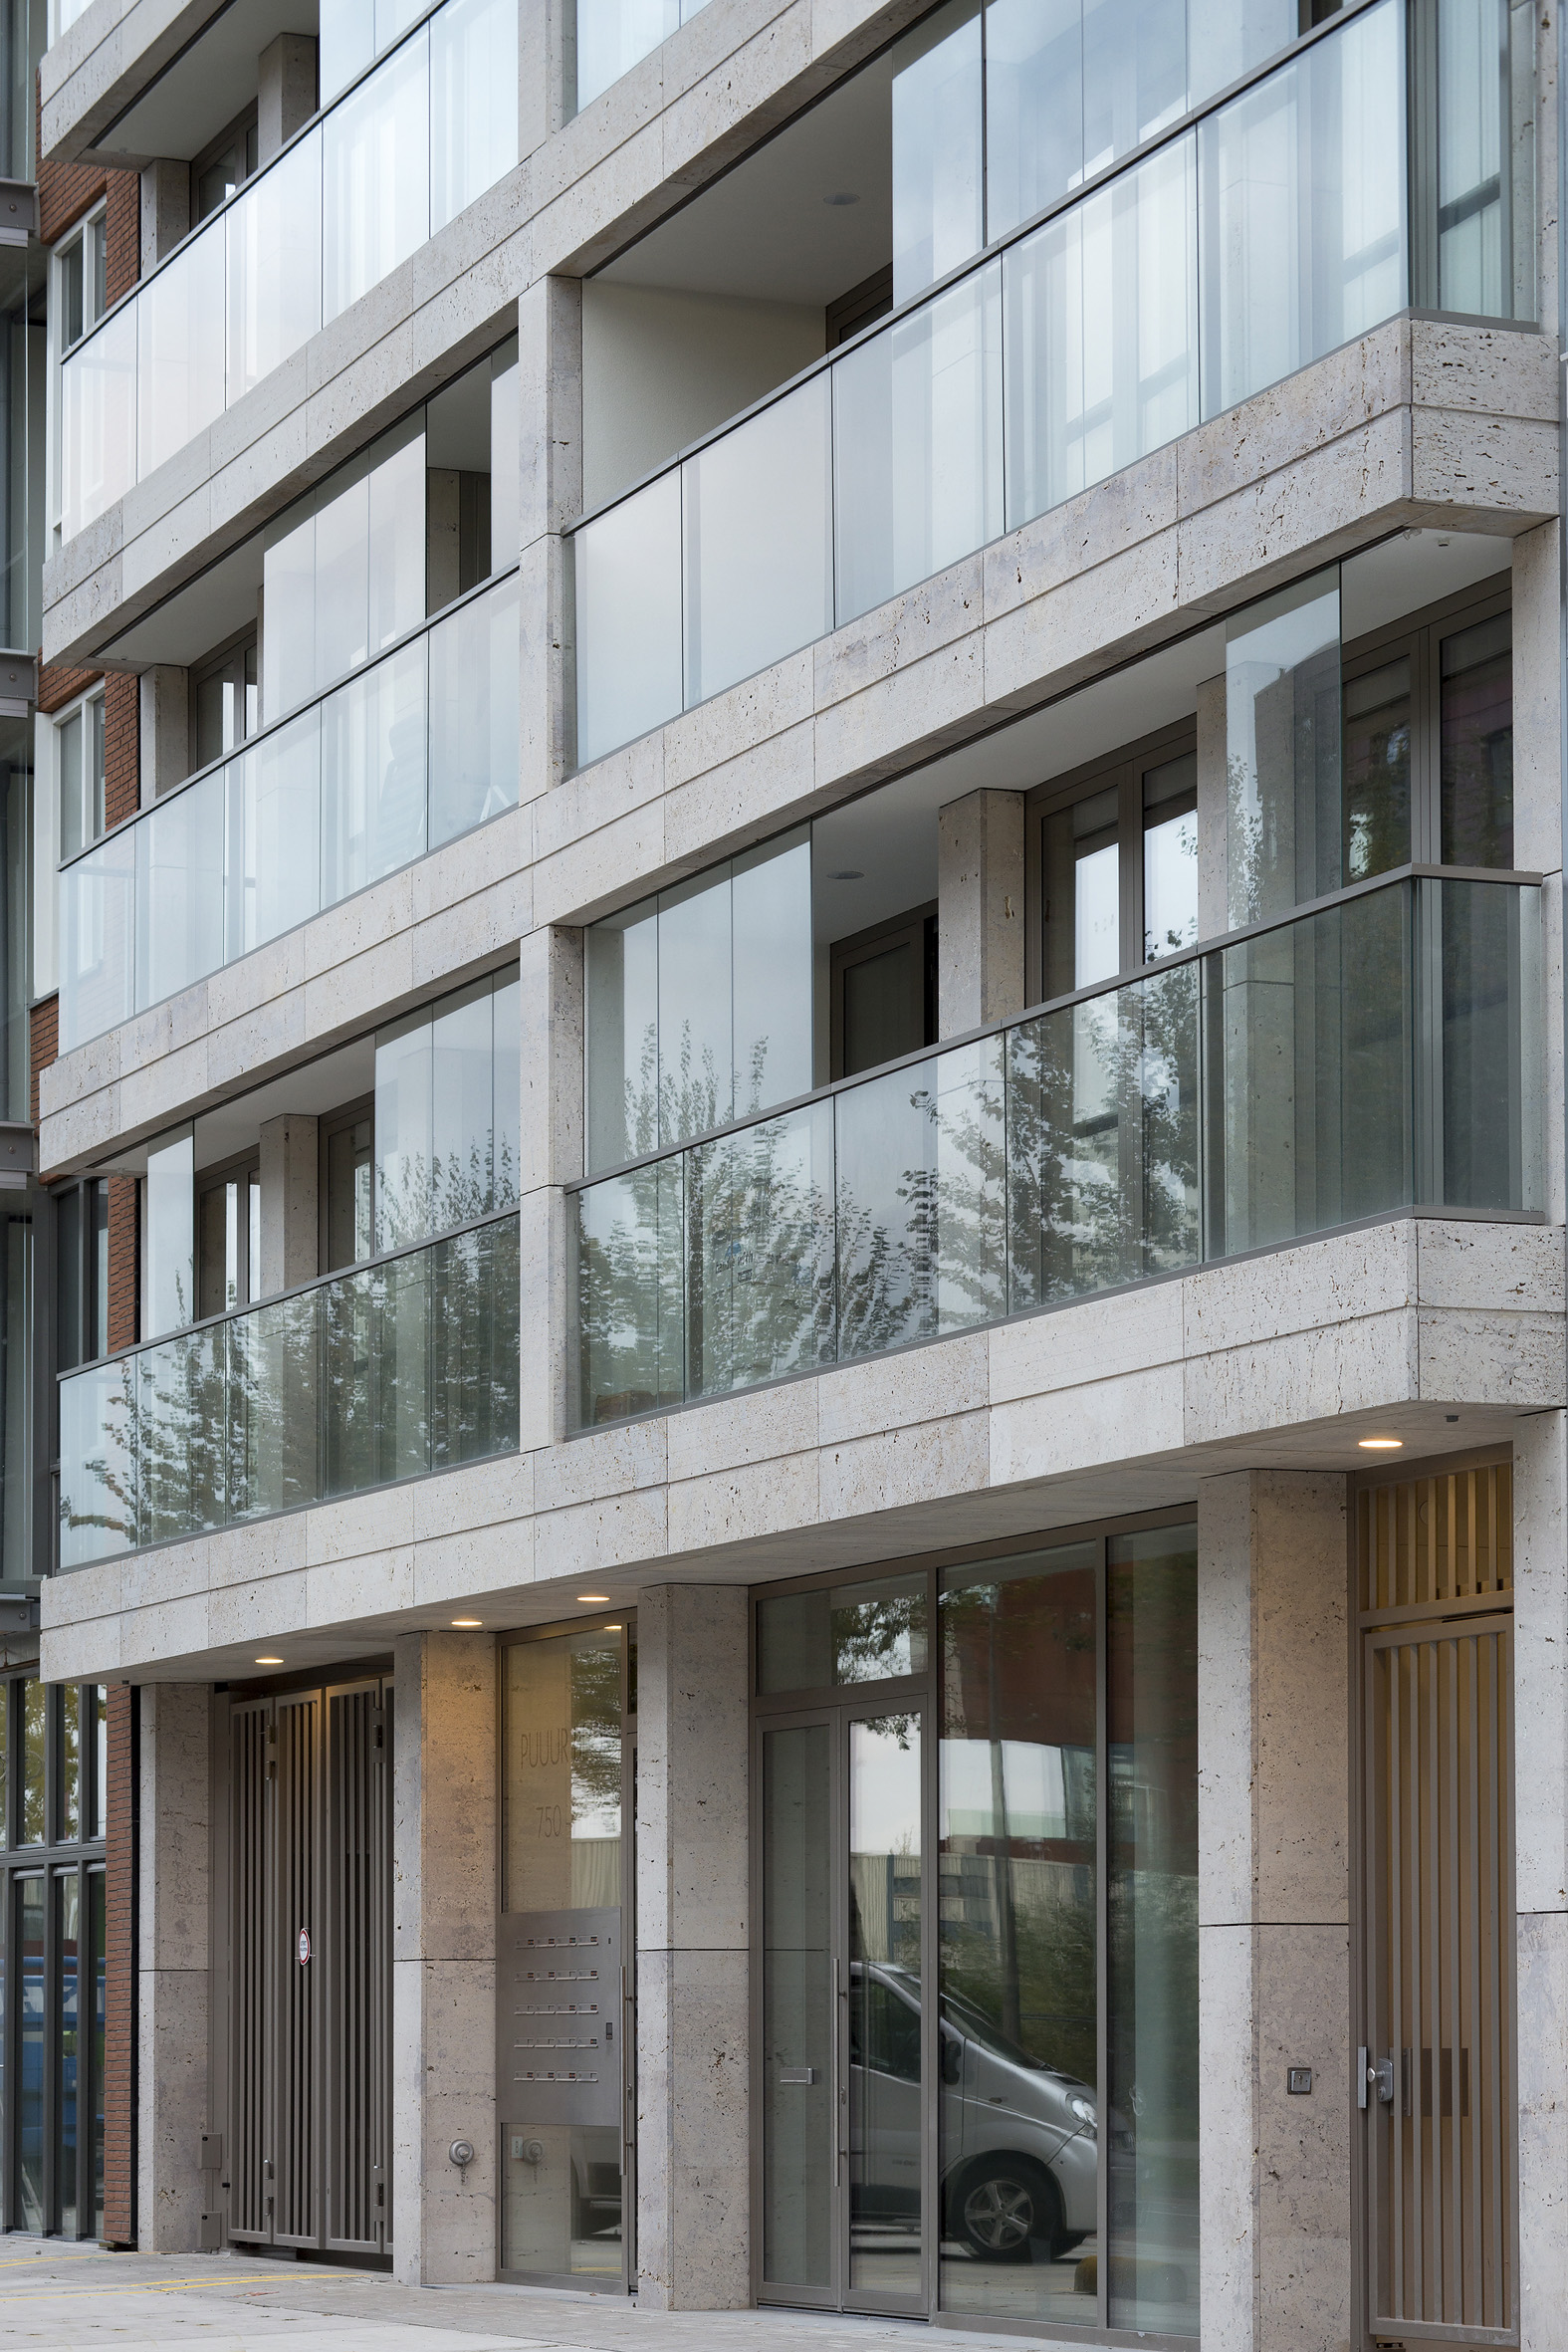 Atelier PUUUR BLOK loft apartement BLOK0 Houthaven Amsterdam CO zelfbouw